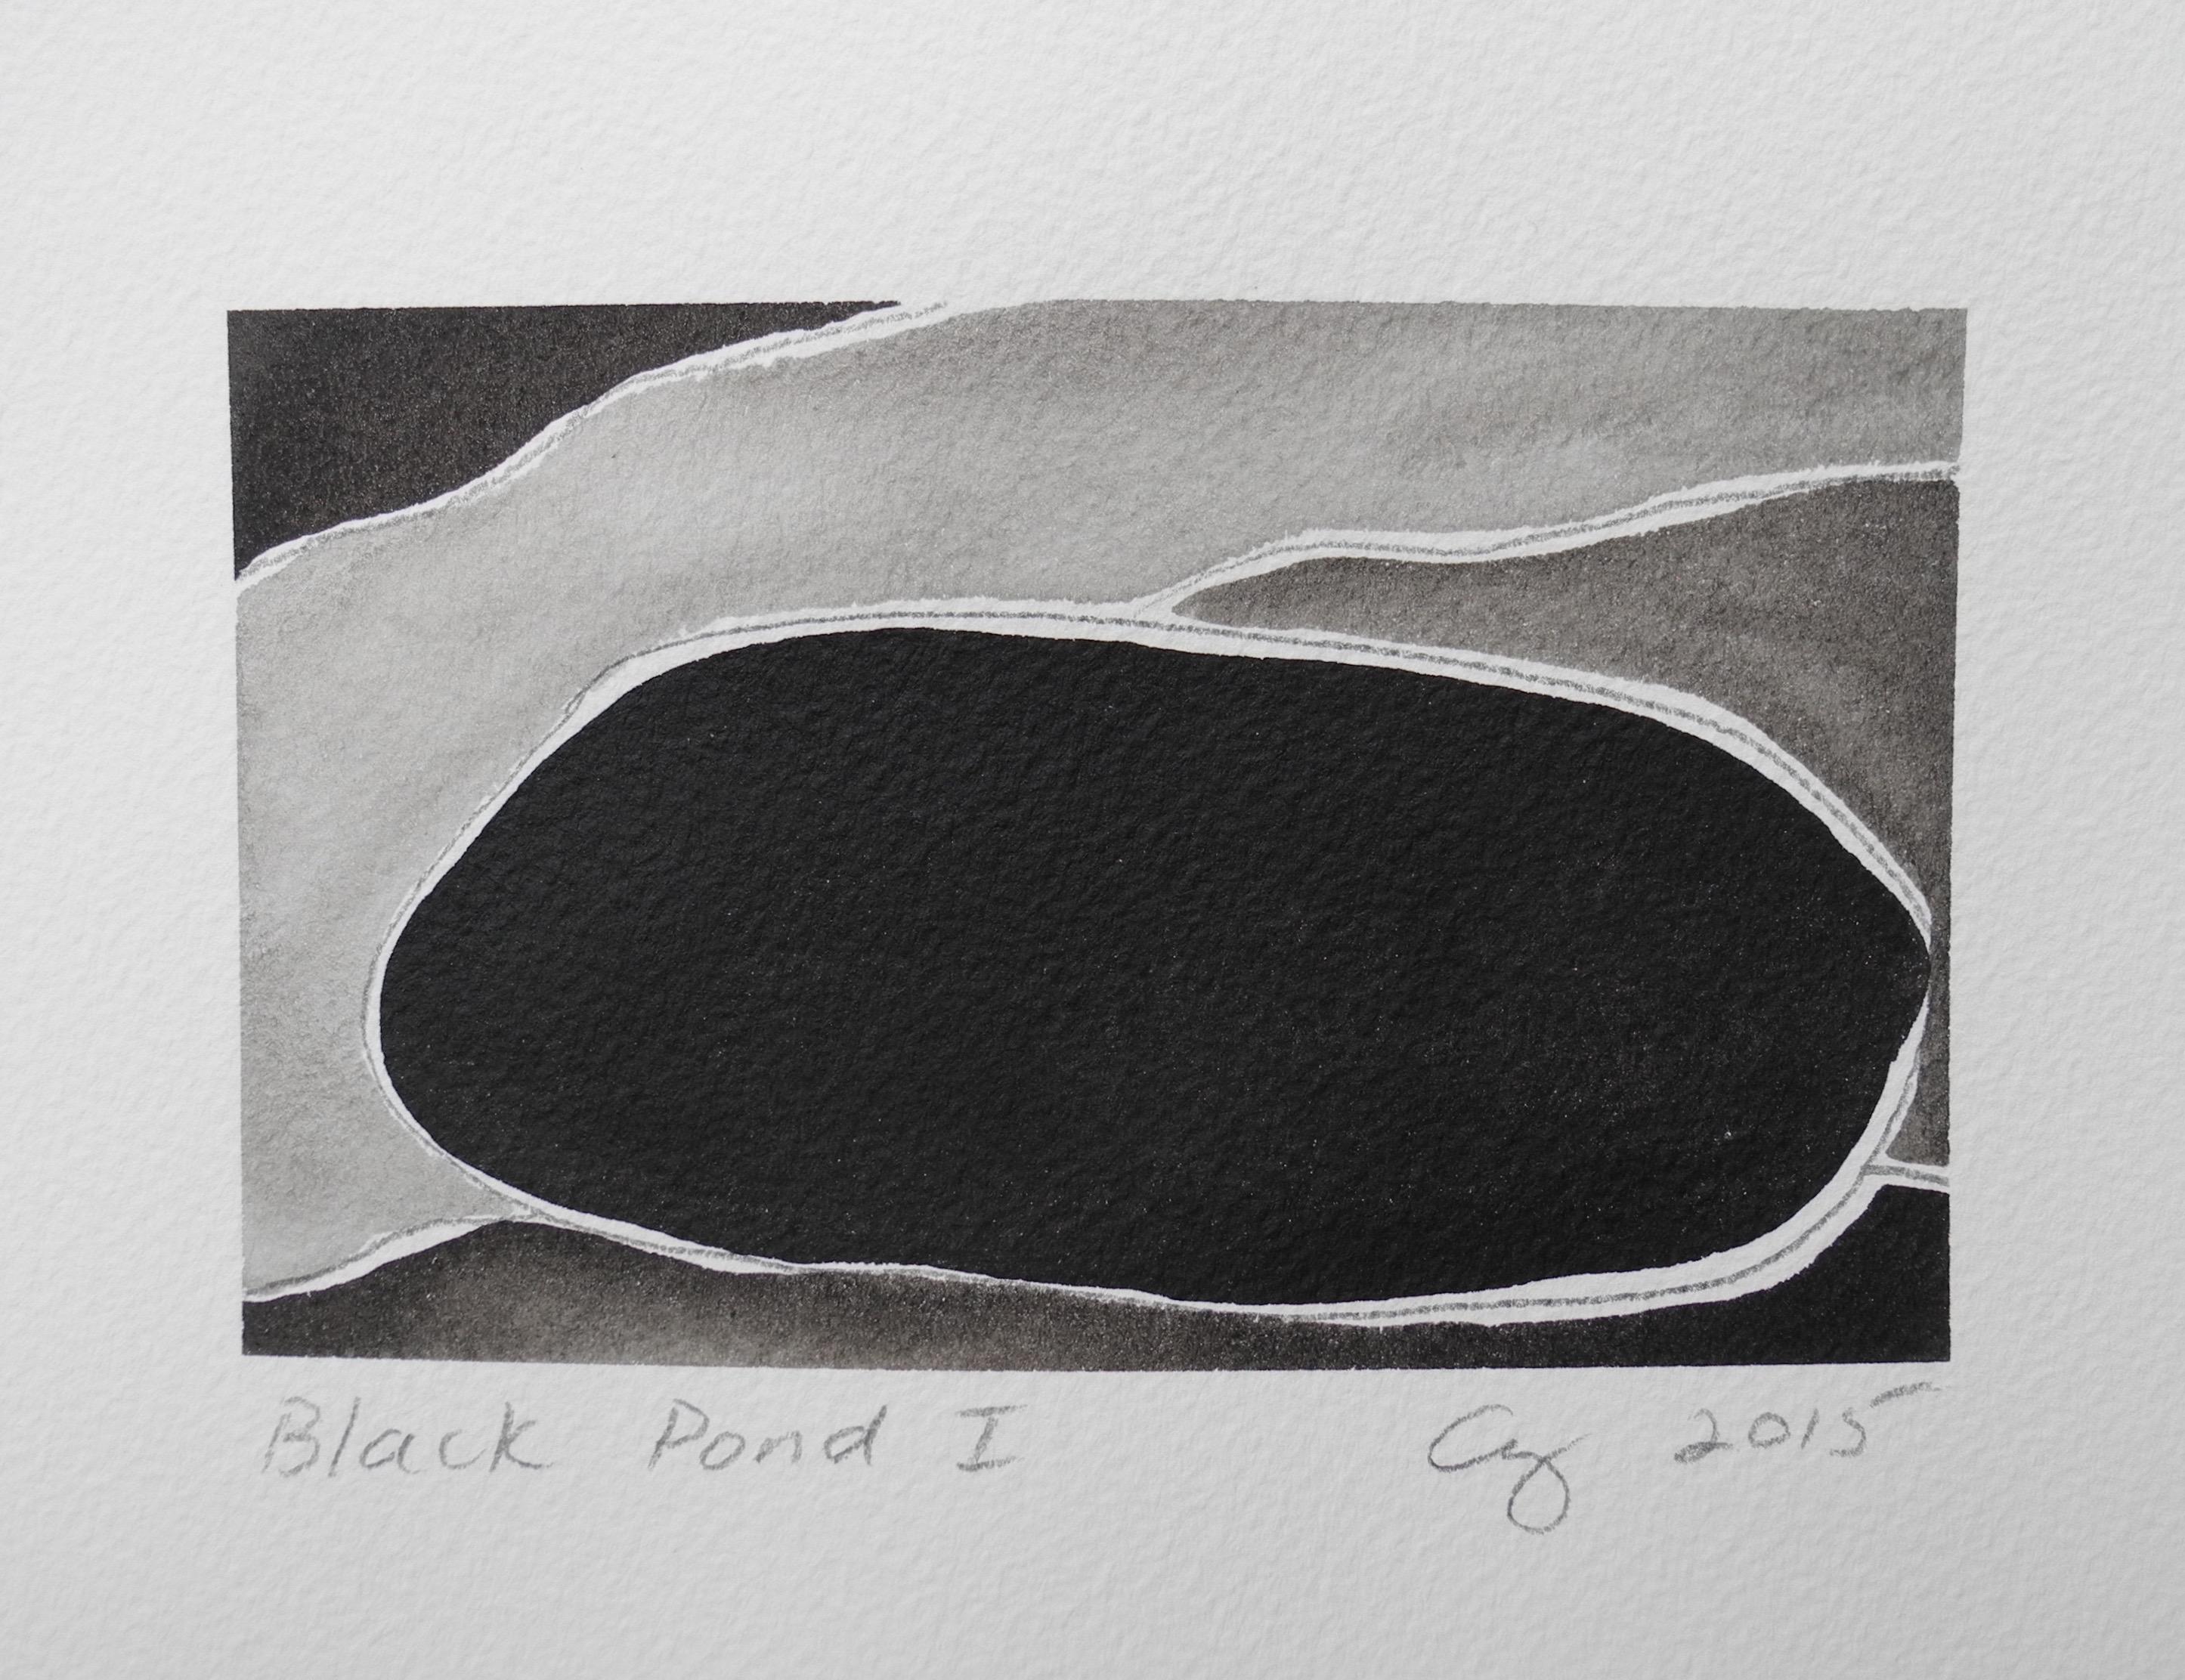 Black Pond I